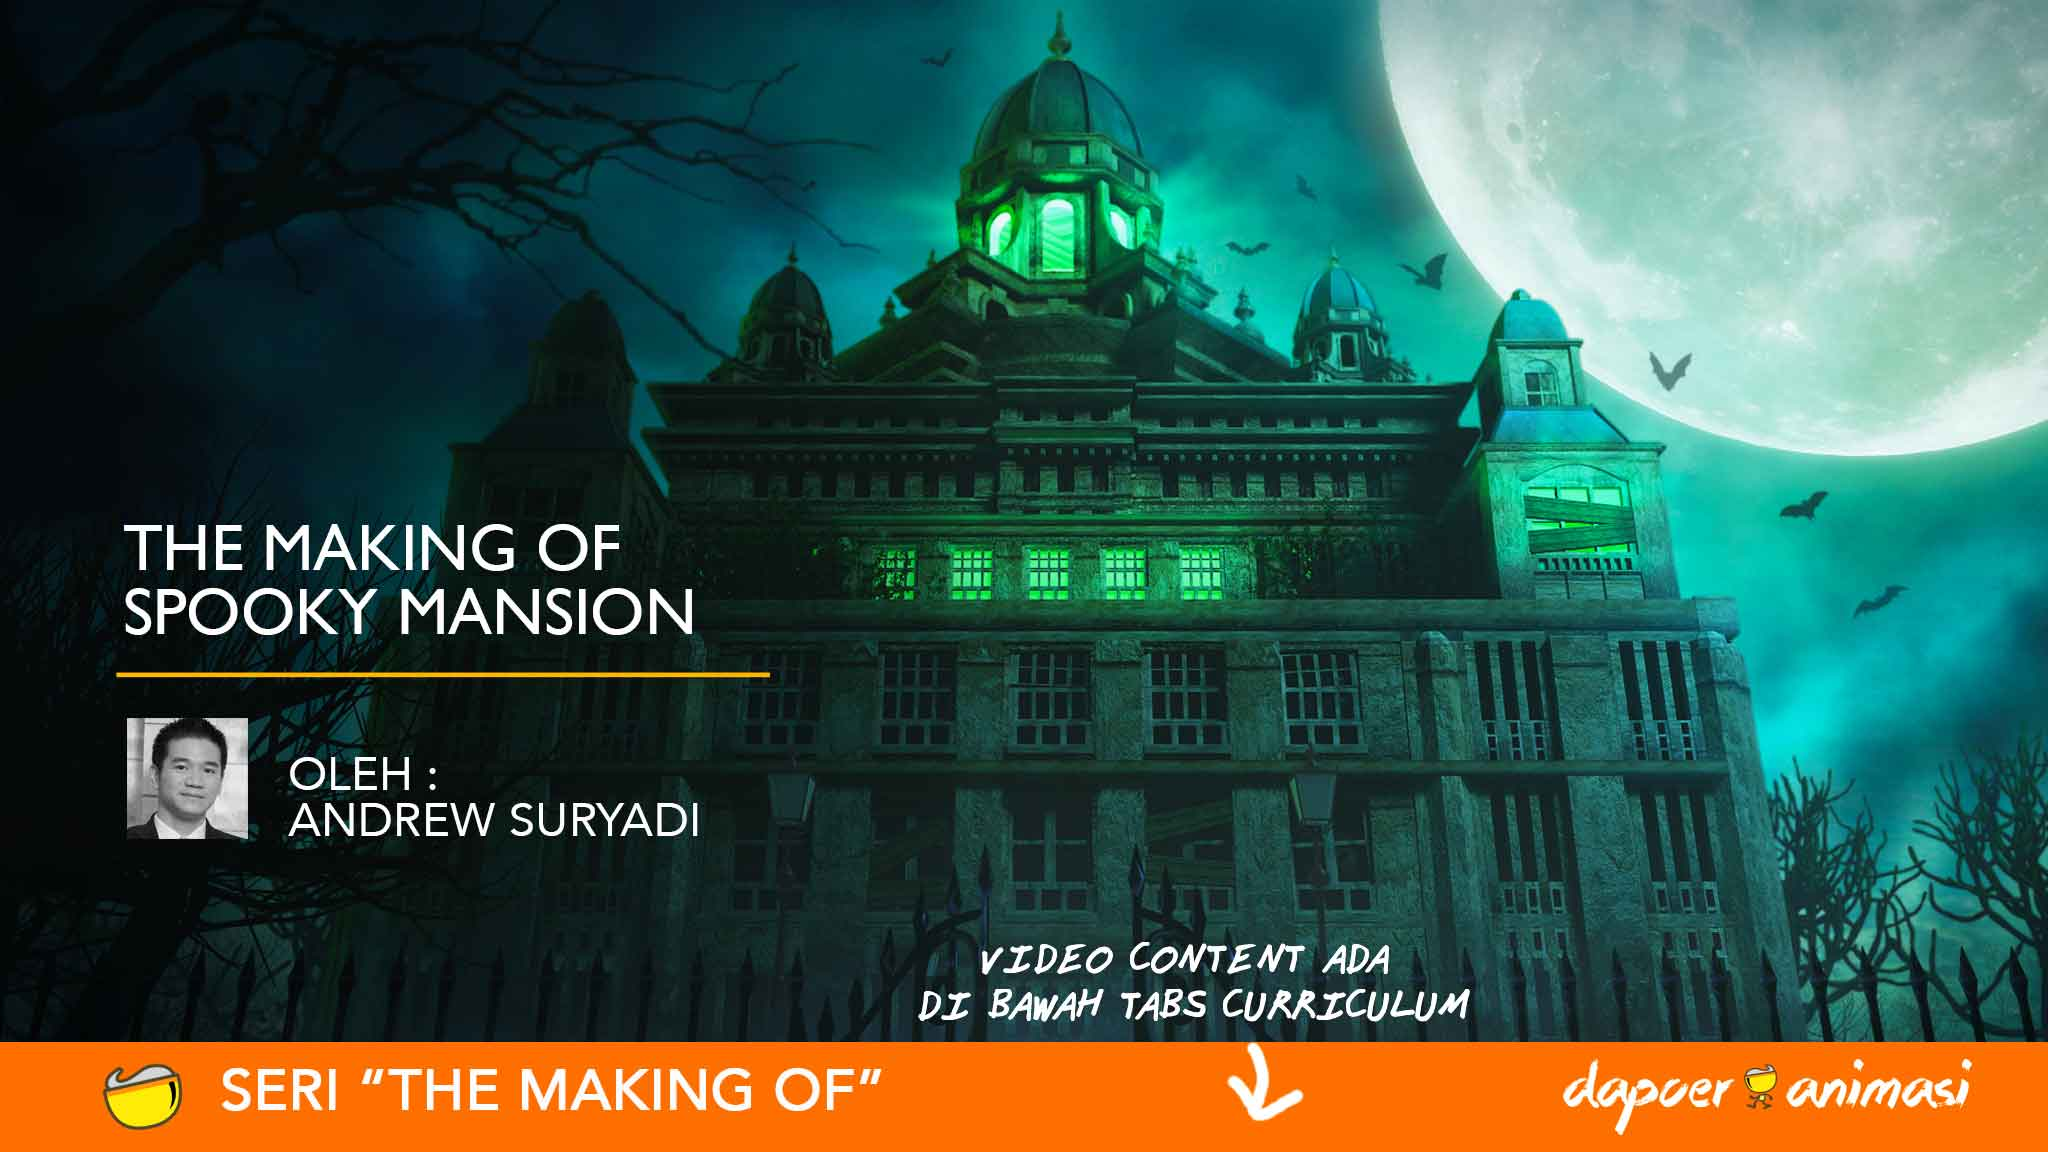 Dapoer Animasi : The Making of Spooky Mansion